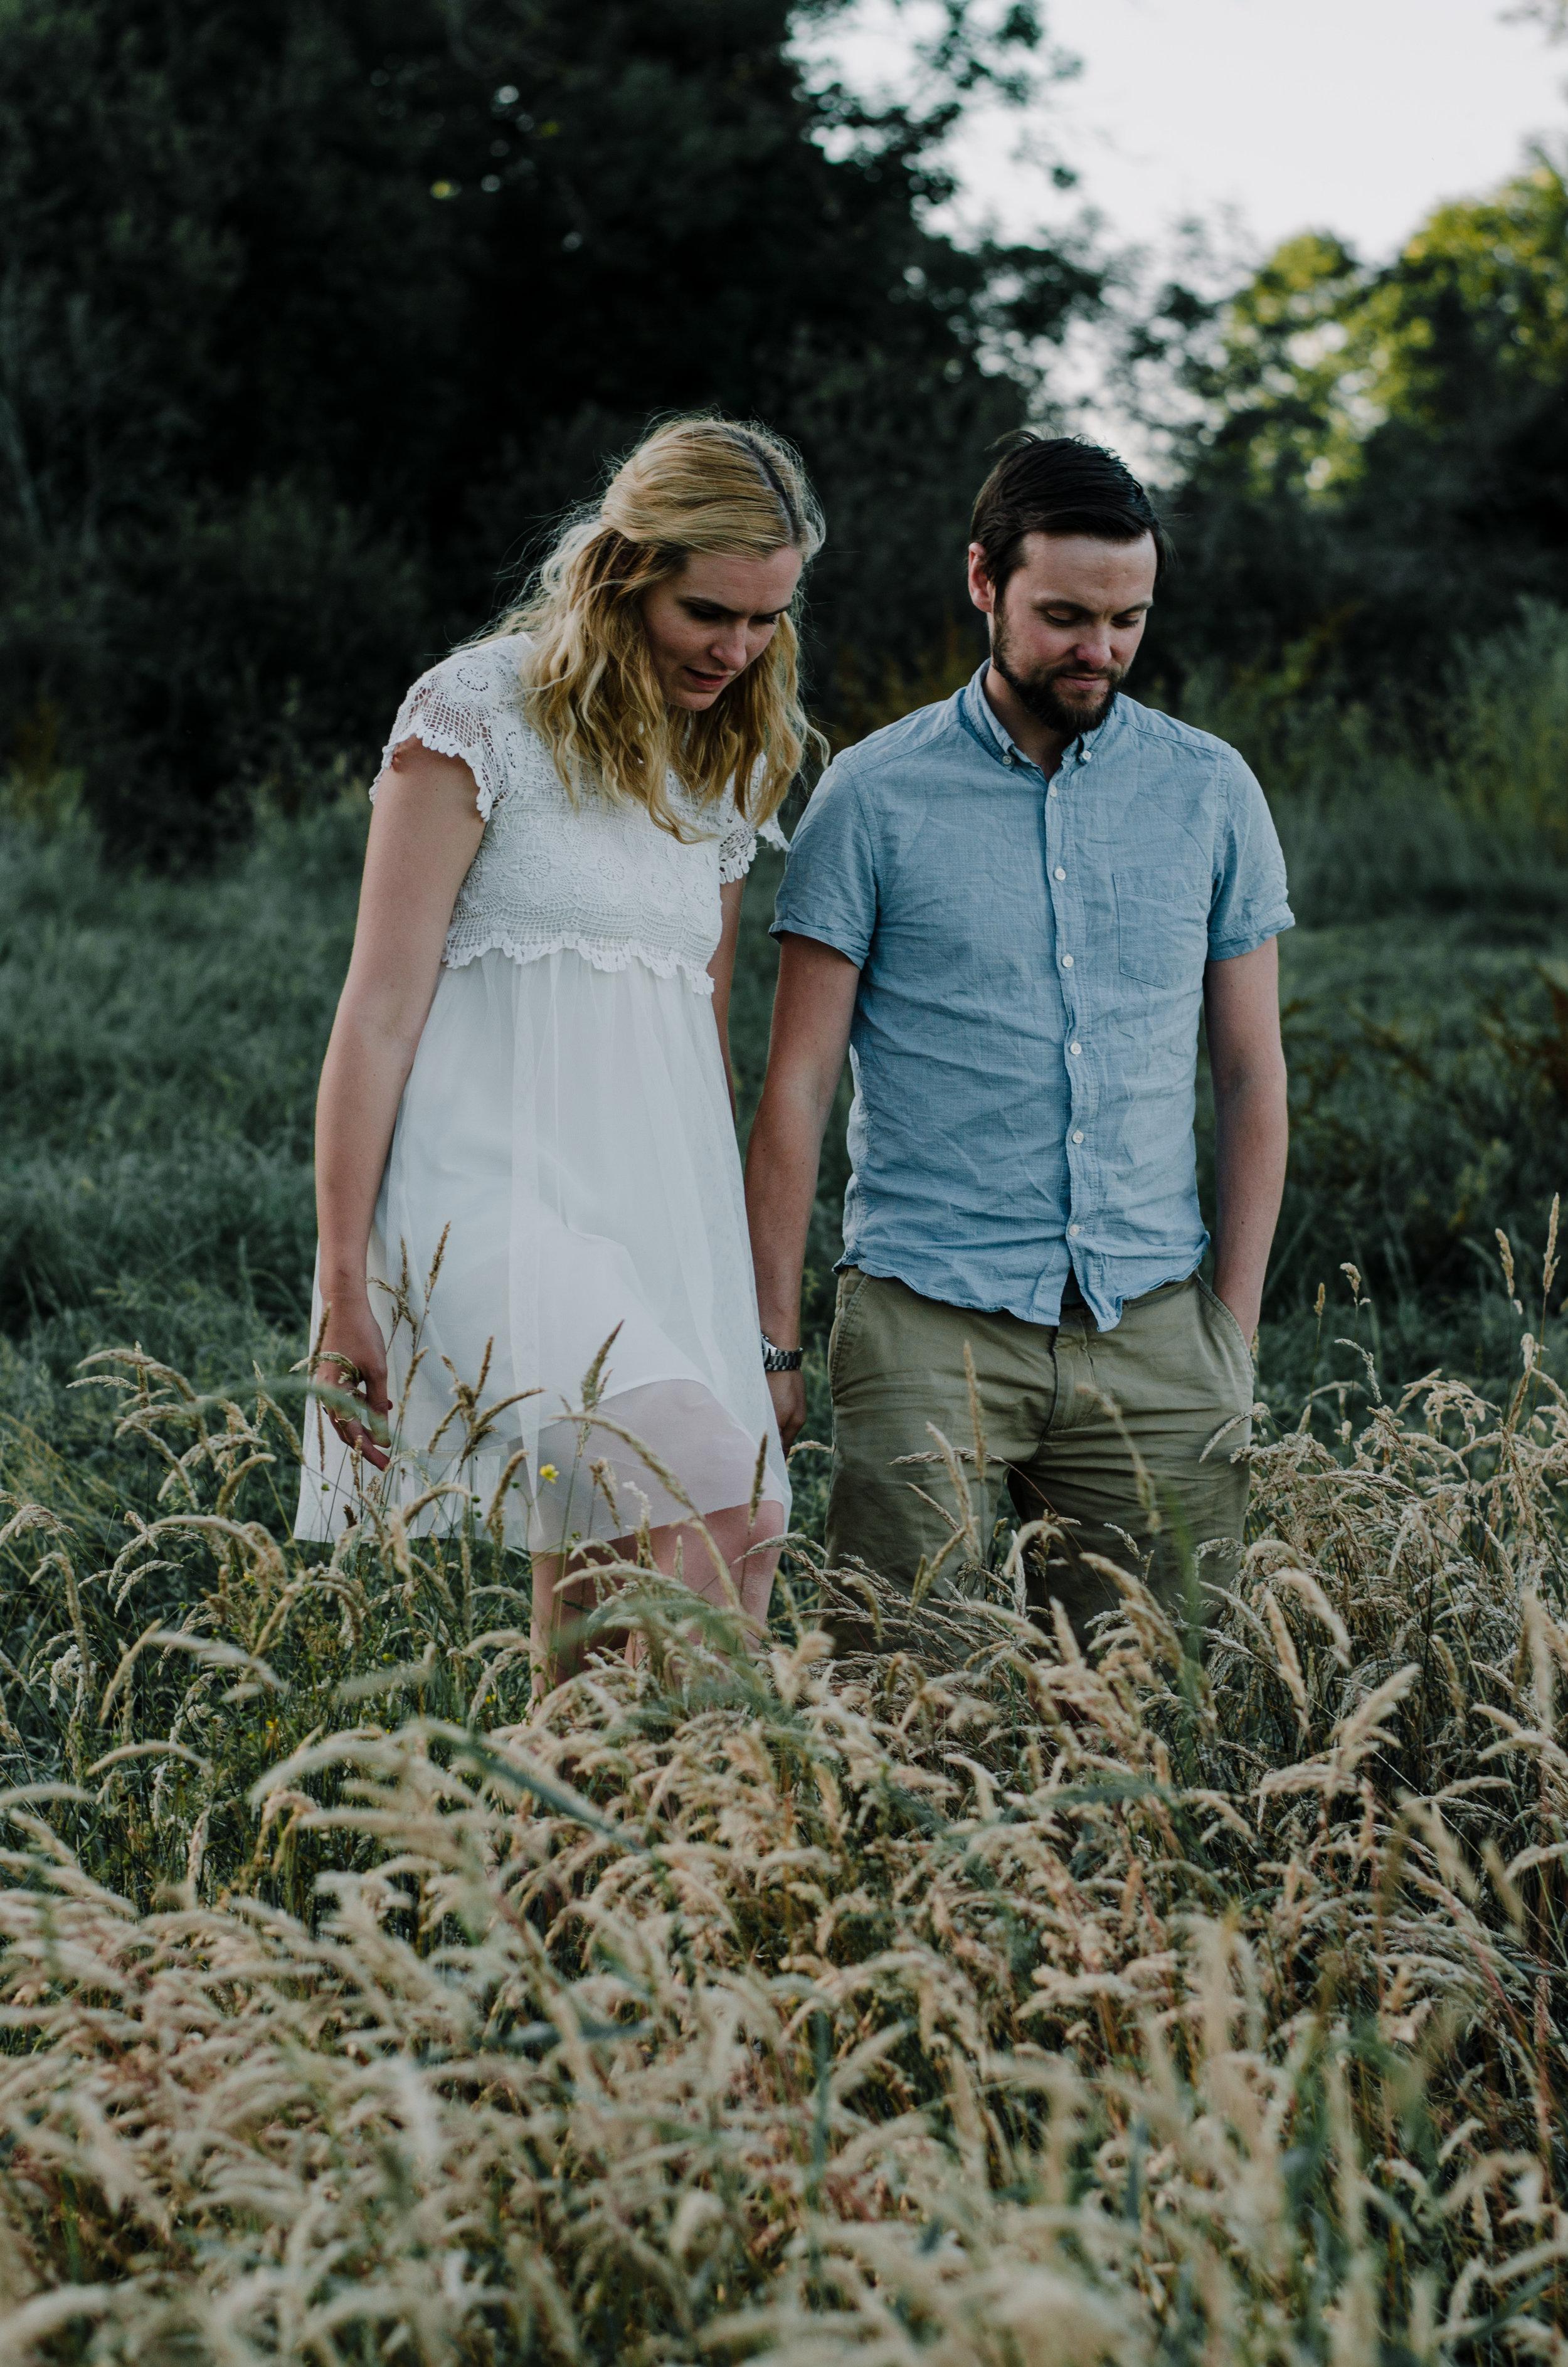 Gina & Chris - Barcombe Mills - Couple Session - Aiste Saulyte Photography-9.jpg